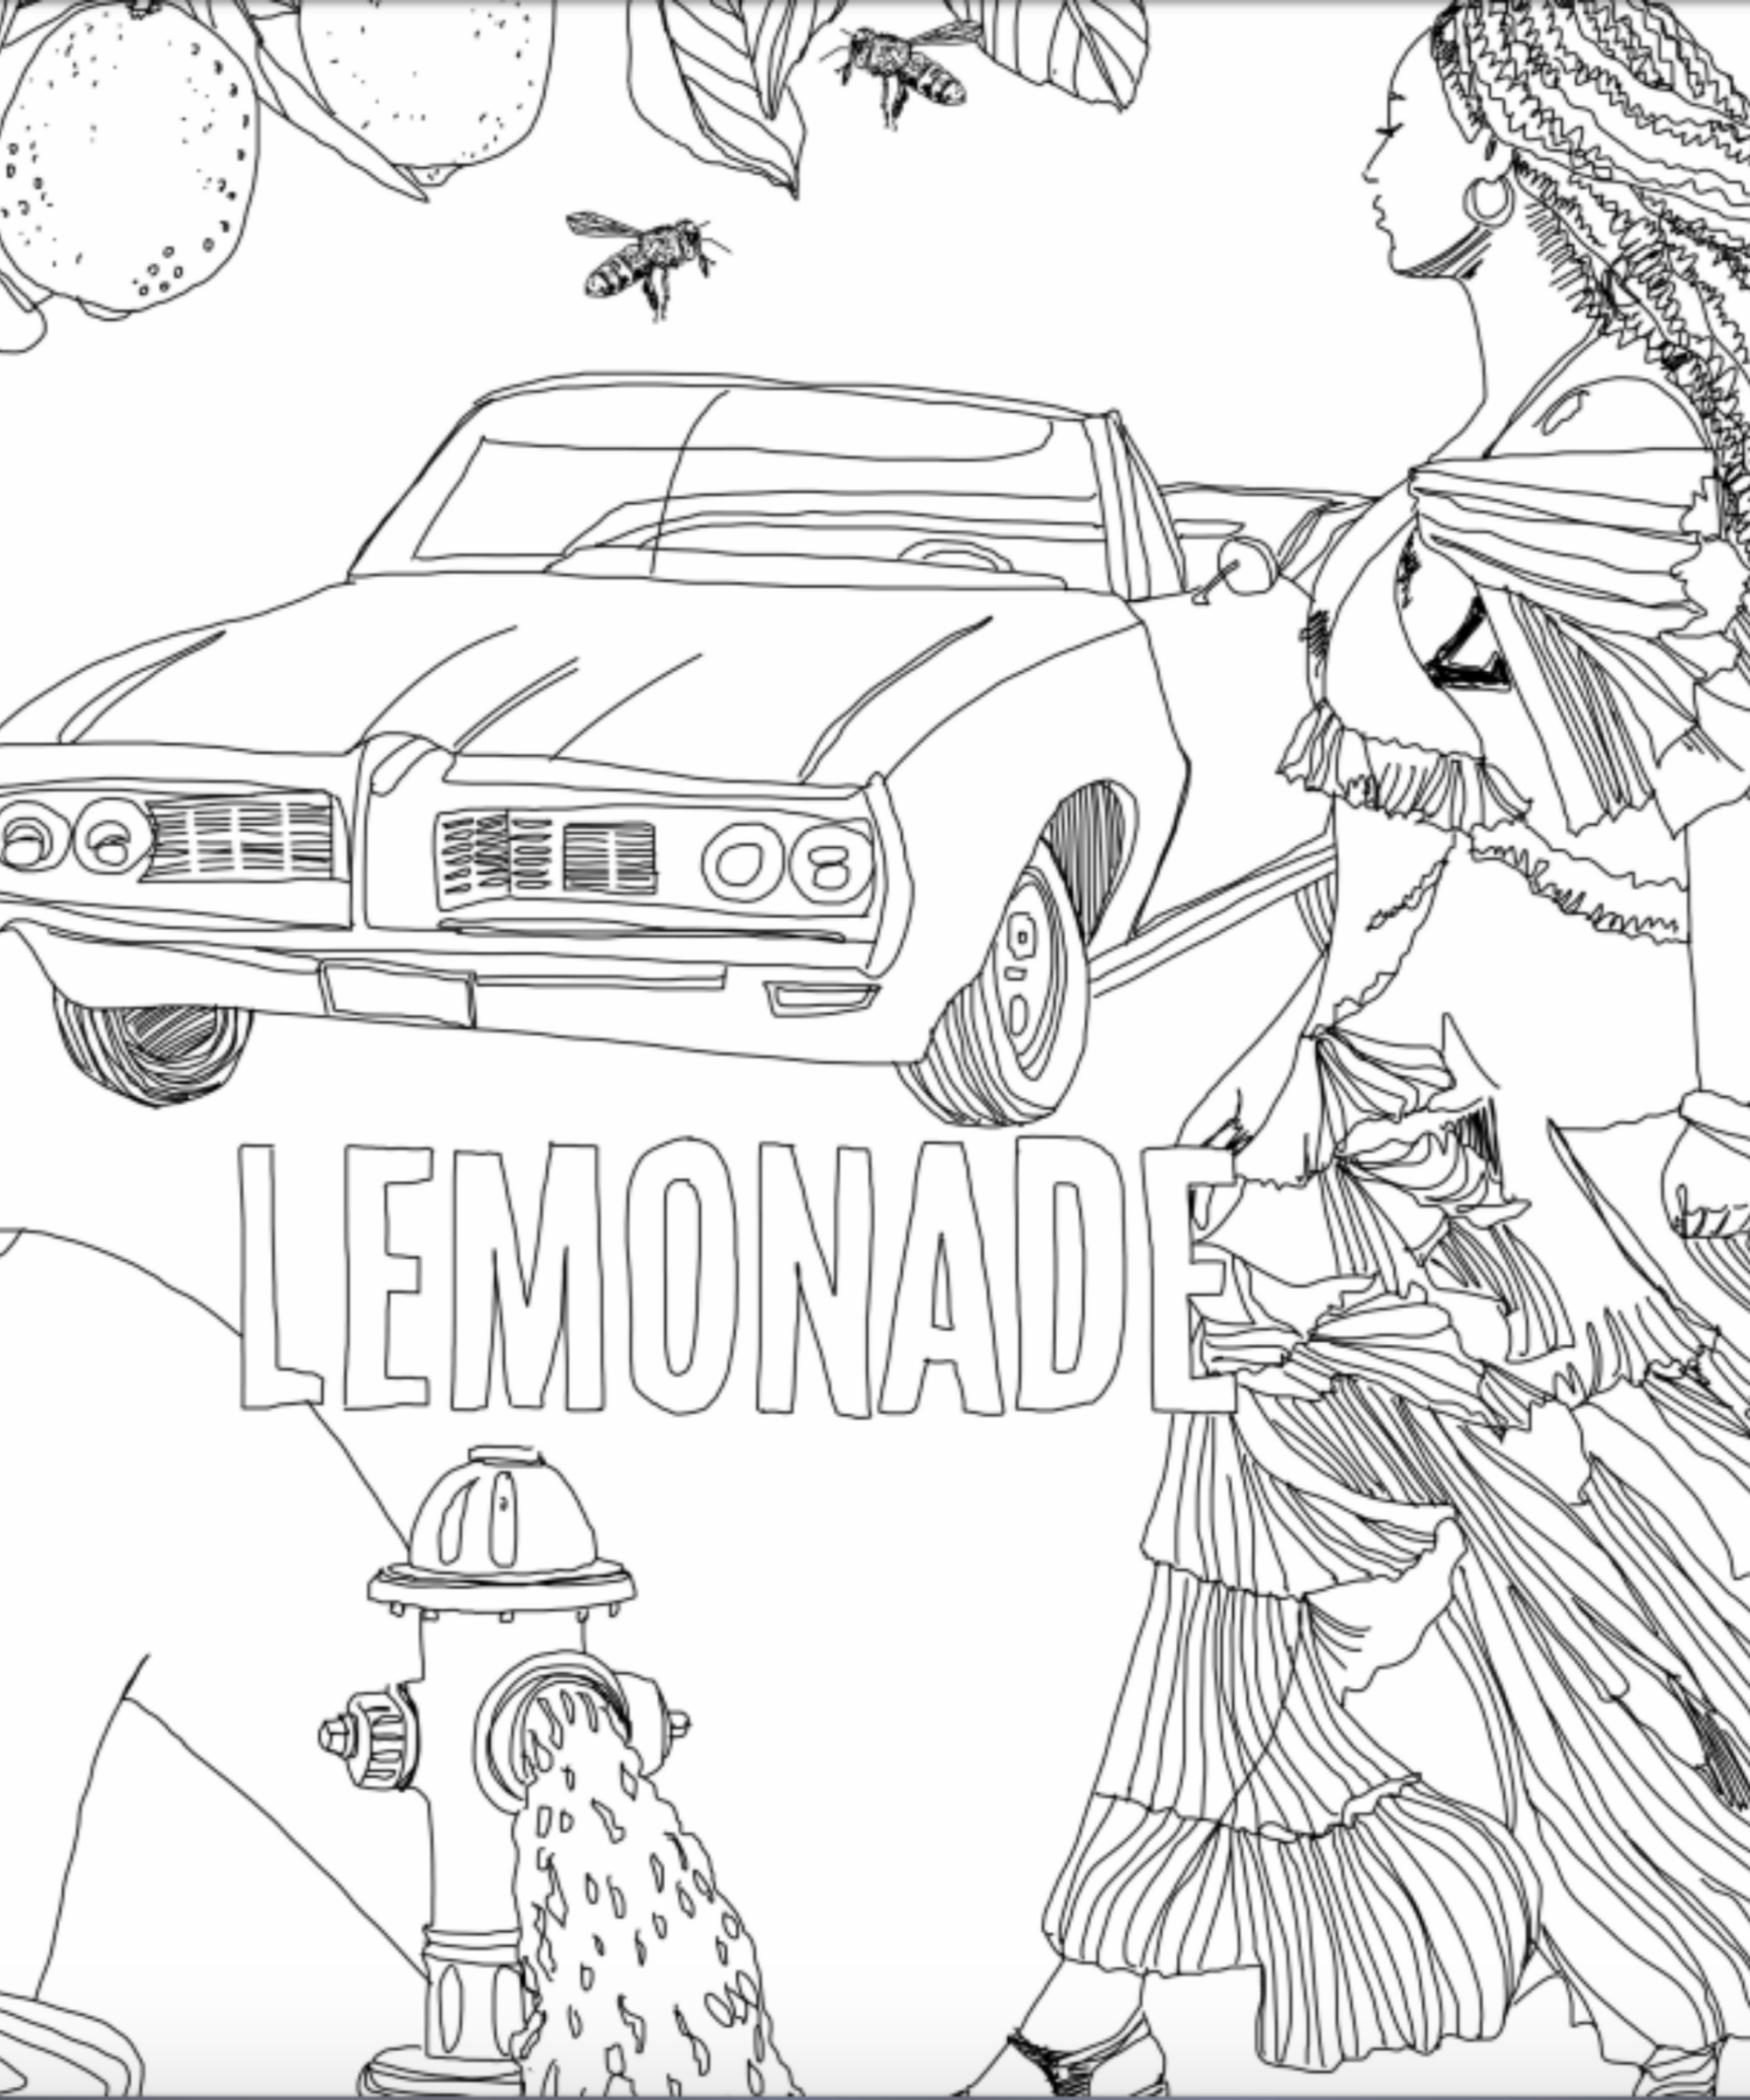 beyonce coloring pages Beyonce Lemonade Coloring Book beyonce coloring pages